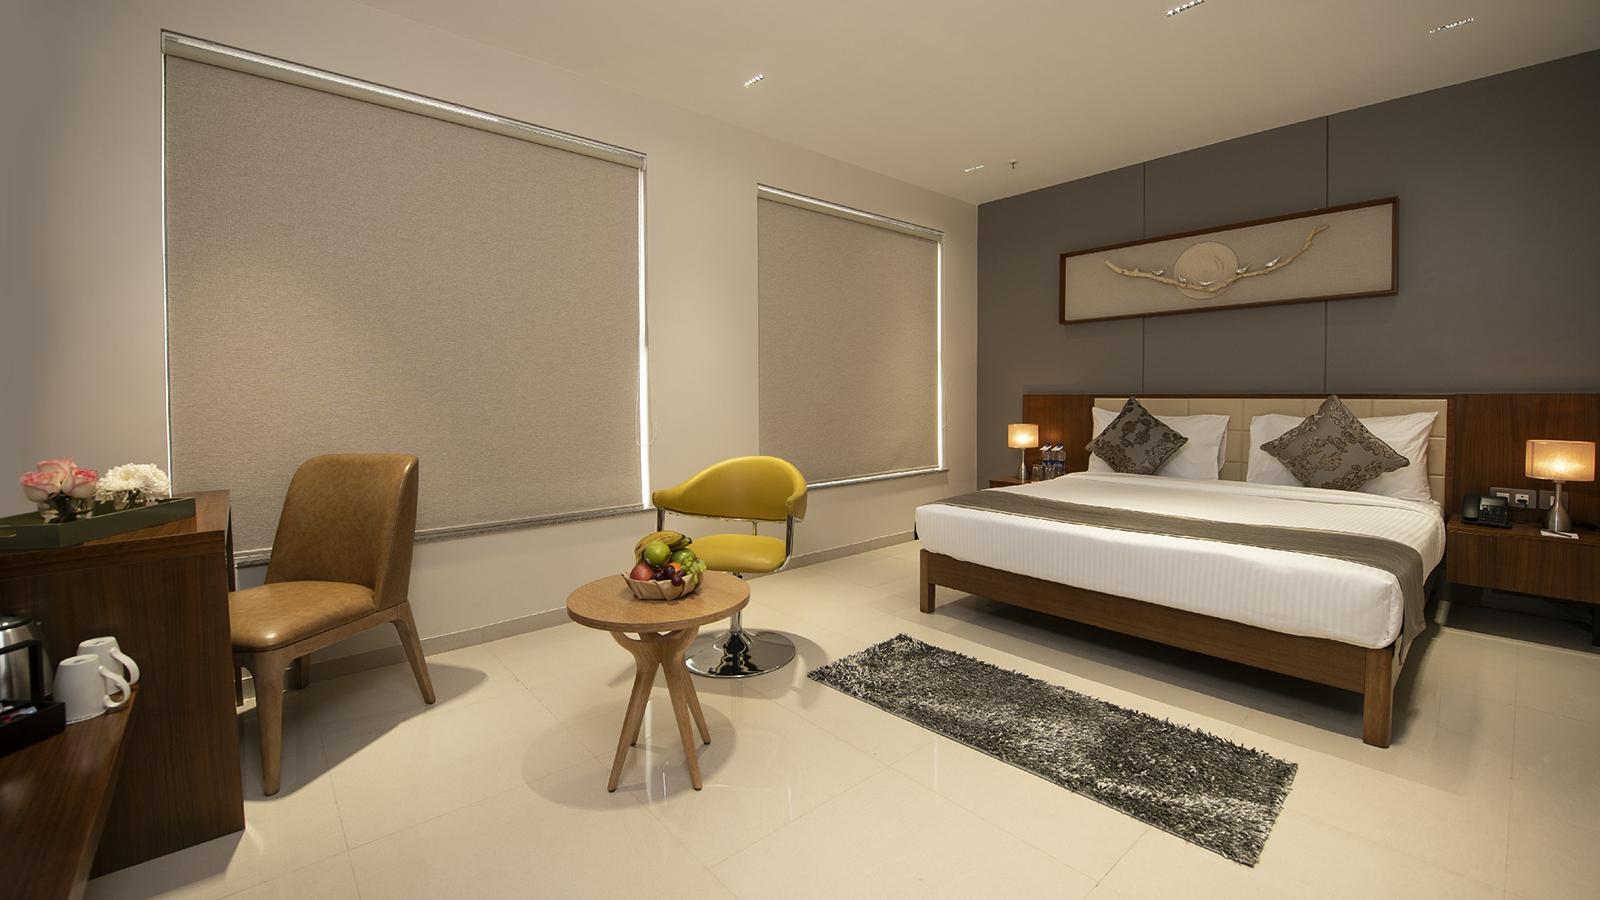 Morvee Hotels